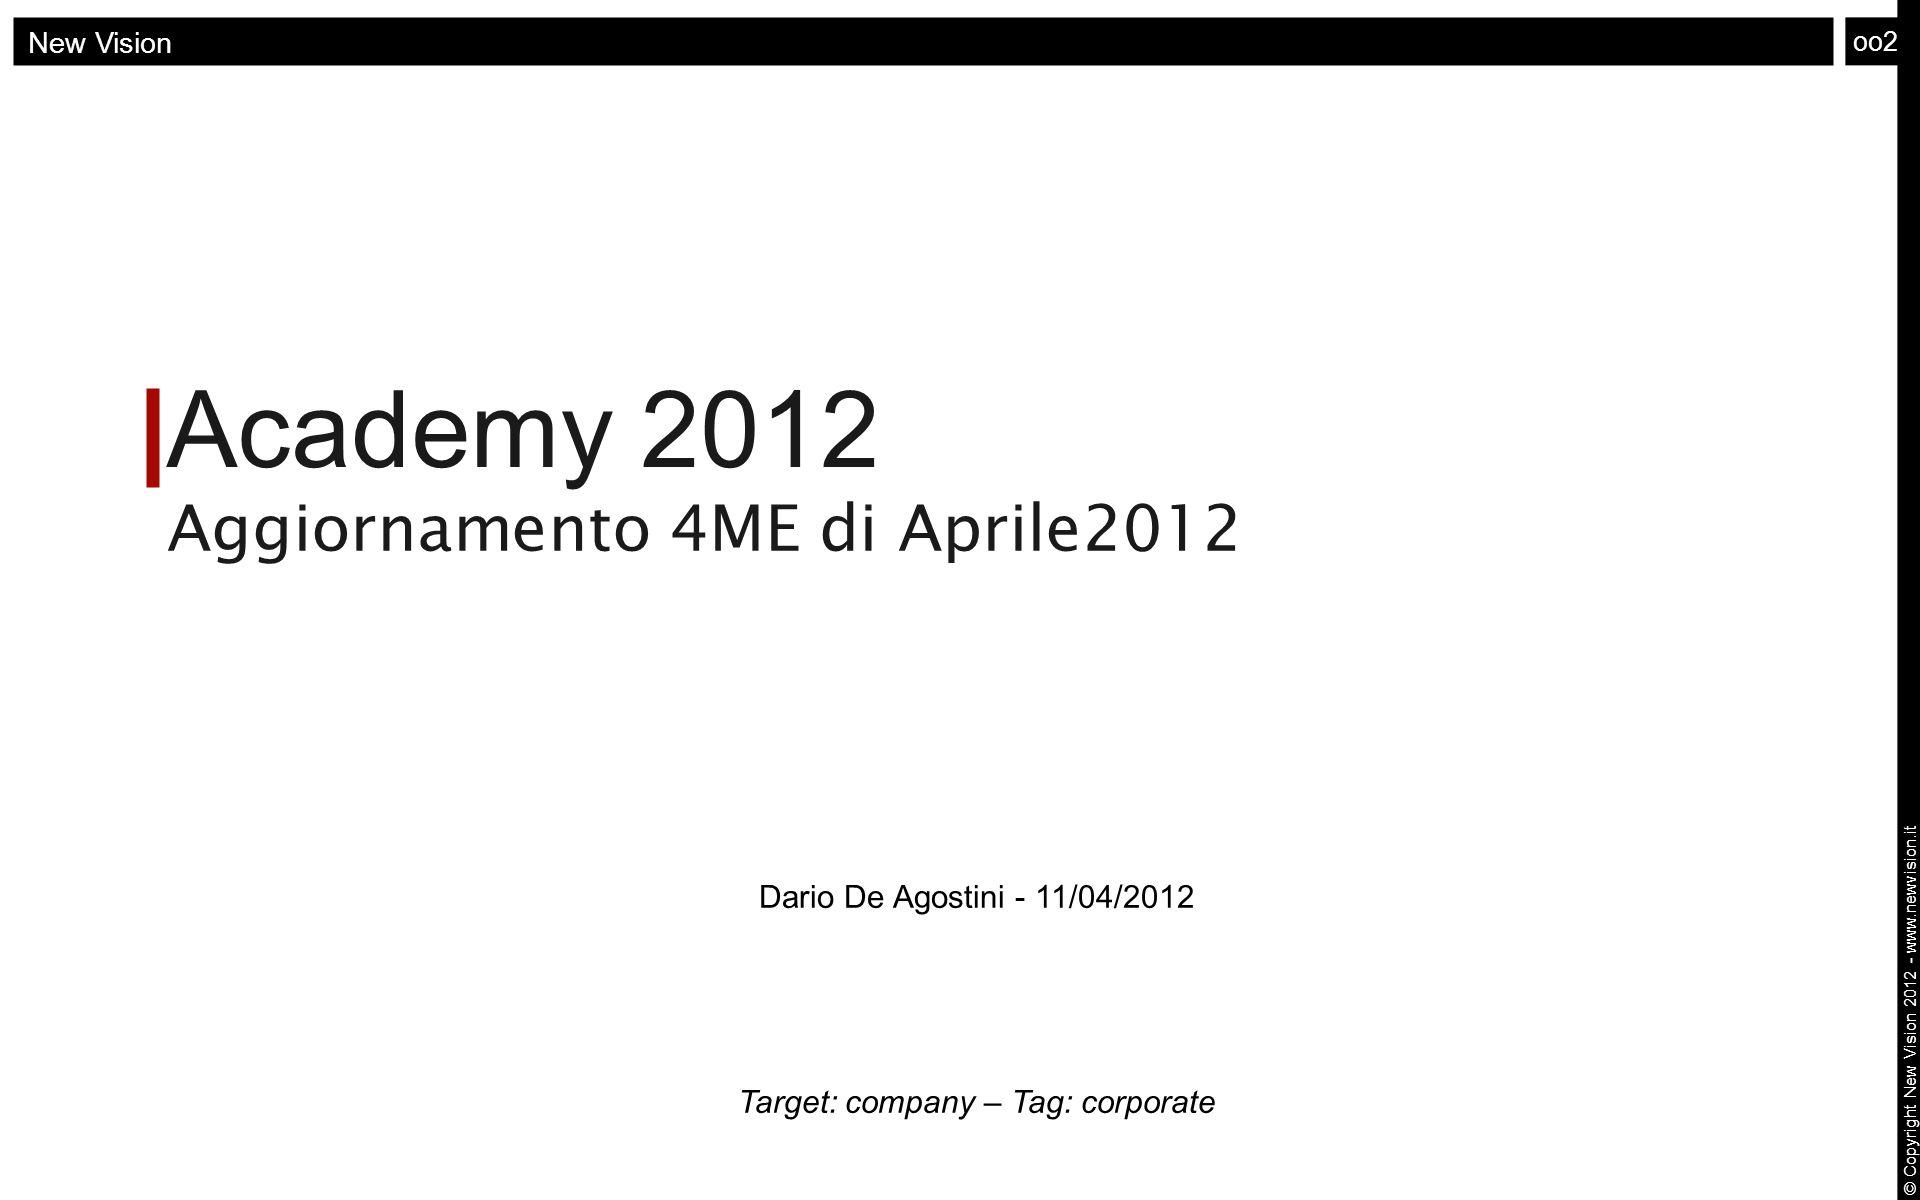 Academy 2012 Aggiornamento 4ME di Aprile2012 oo2 © Copyright New Vision 2012 - www.newvision.it New Vision Dario De Agostini - 11/04/2012 Target: comp